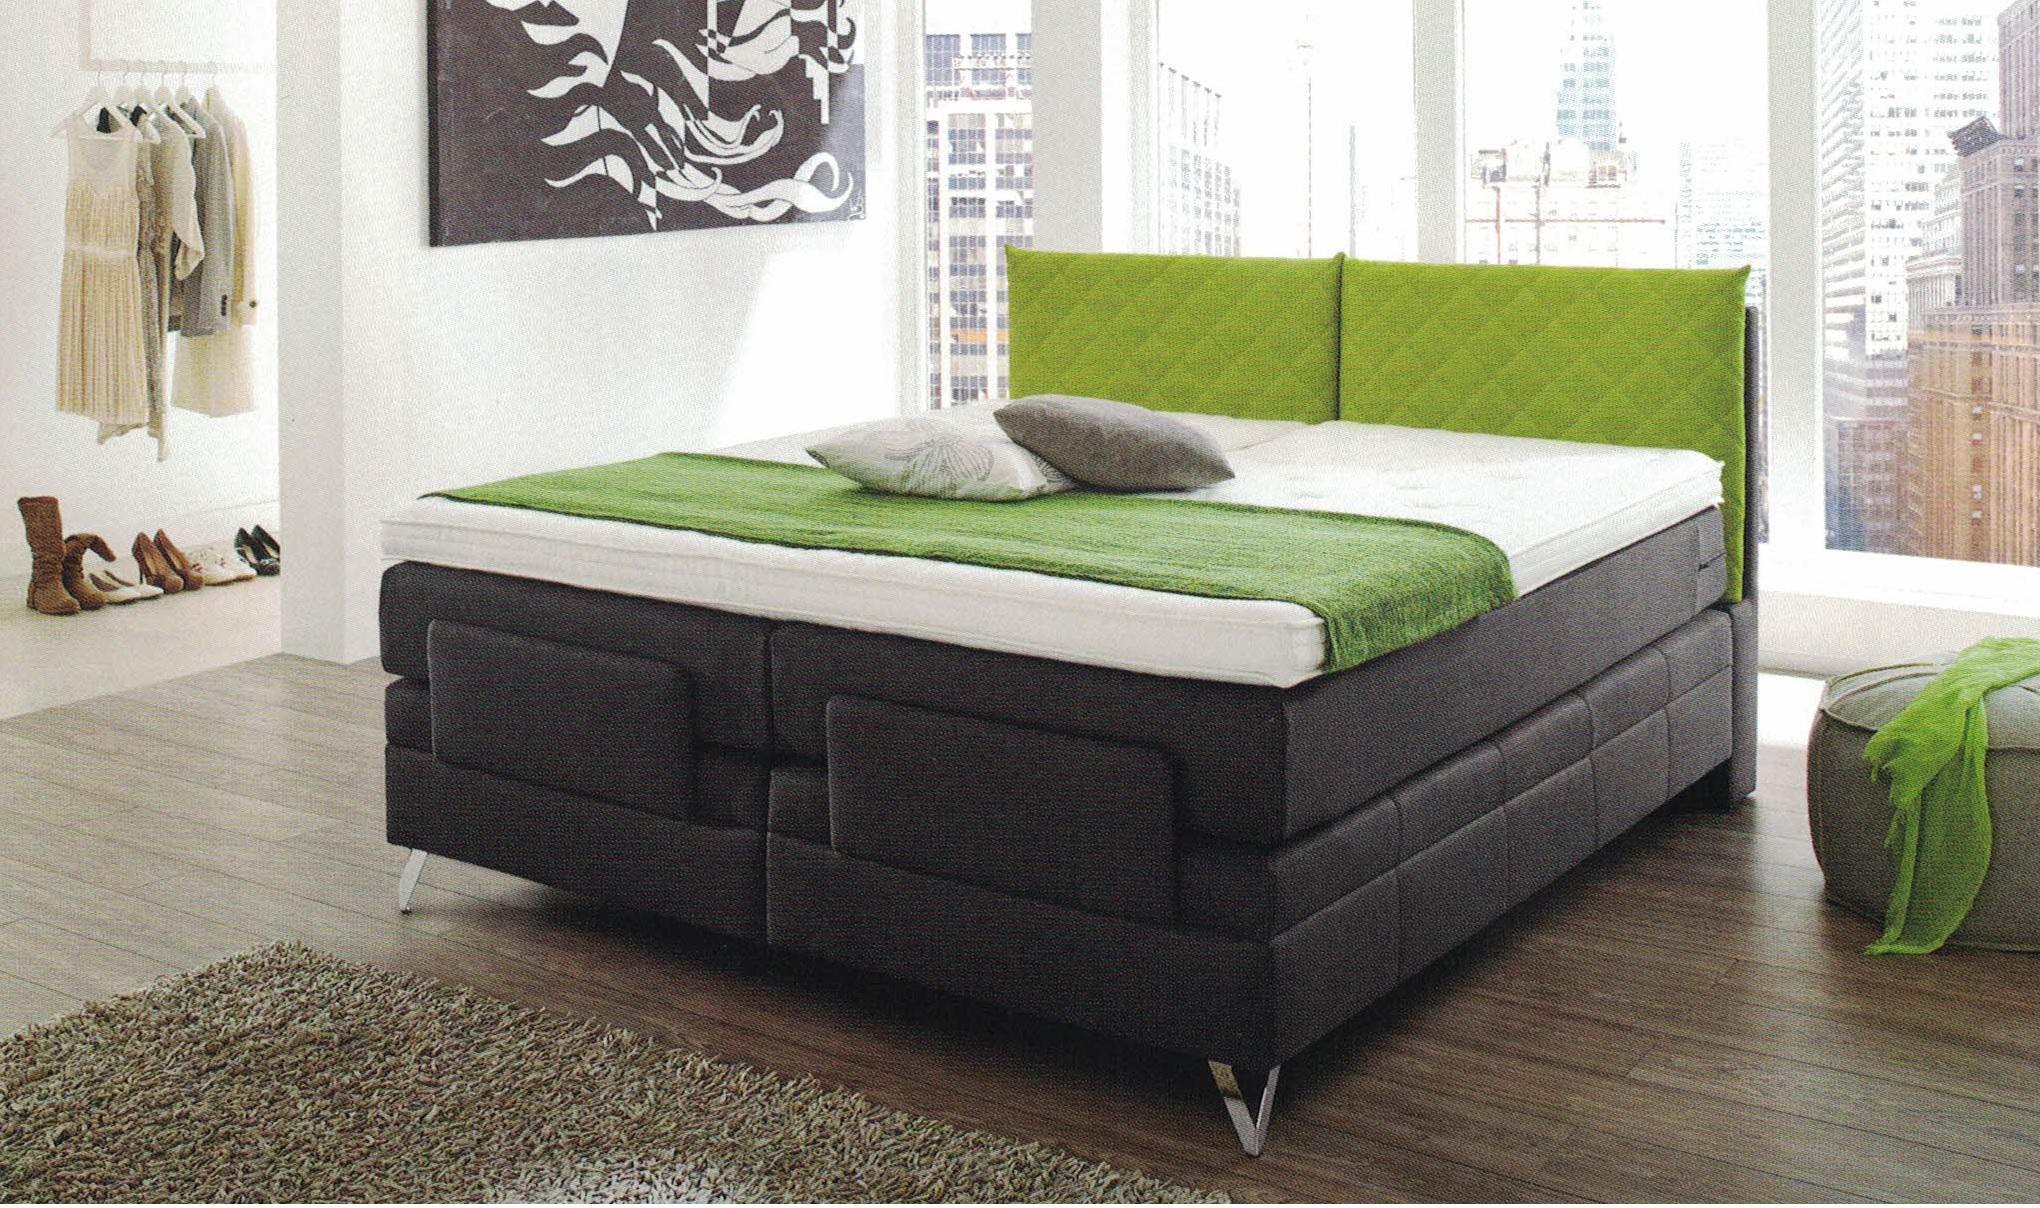 melil boxspringbett m bel international. Black Bedroom Furniture Sets. Home Design Ideas